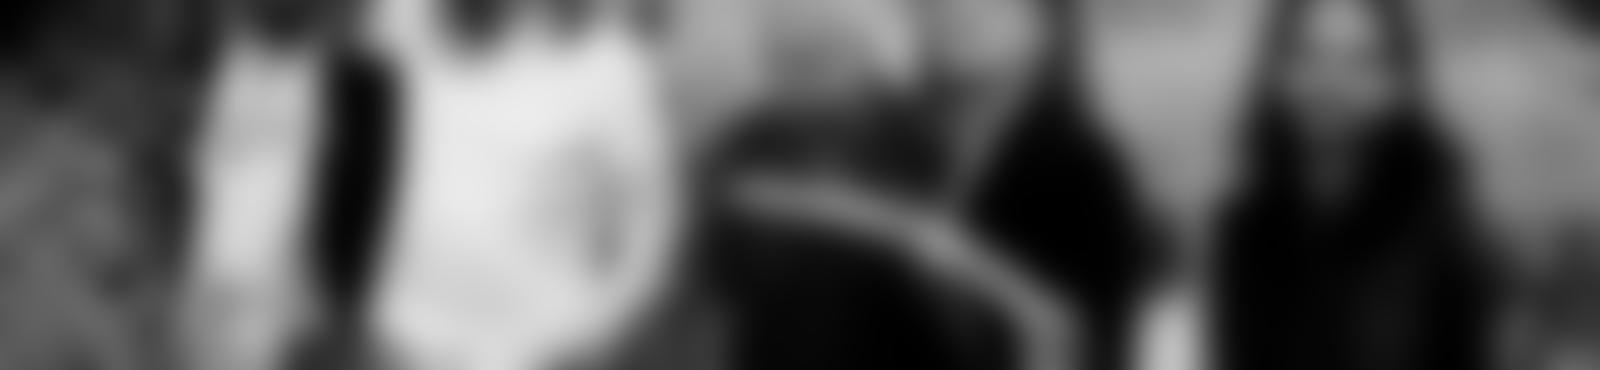 Blurred c0fa1e84 ebca 49dc 8ca6 ad6fb6d2072a